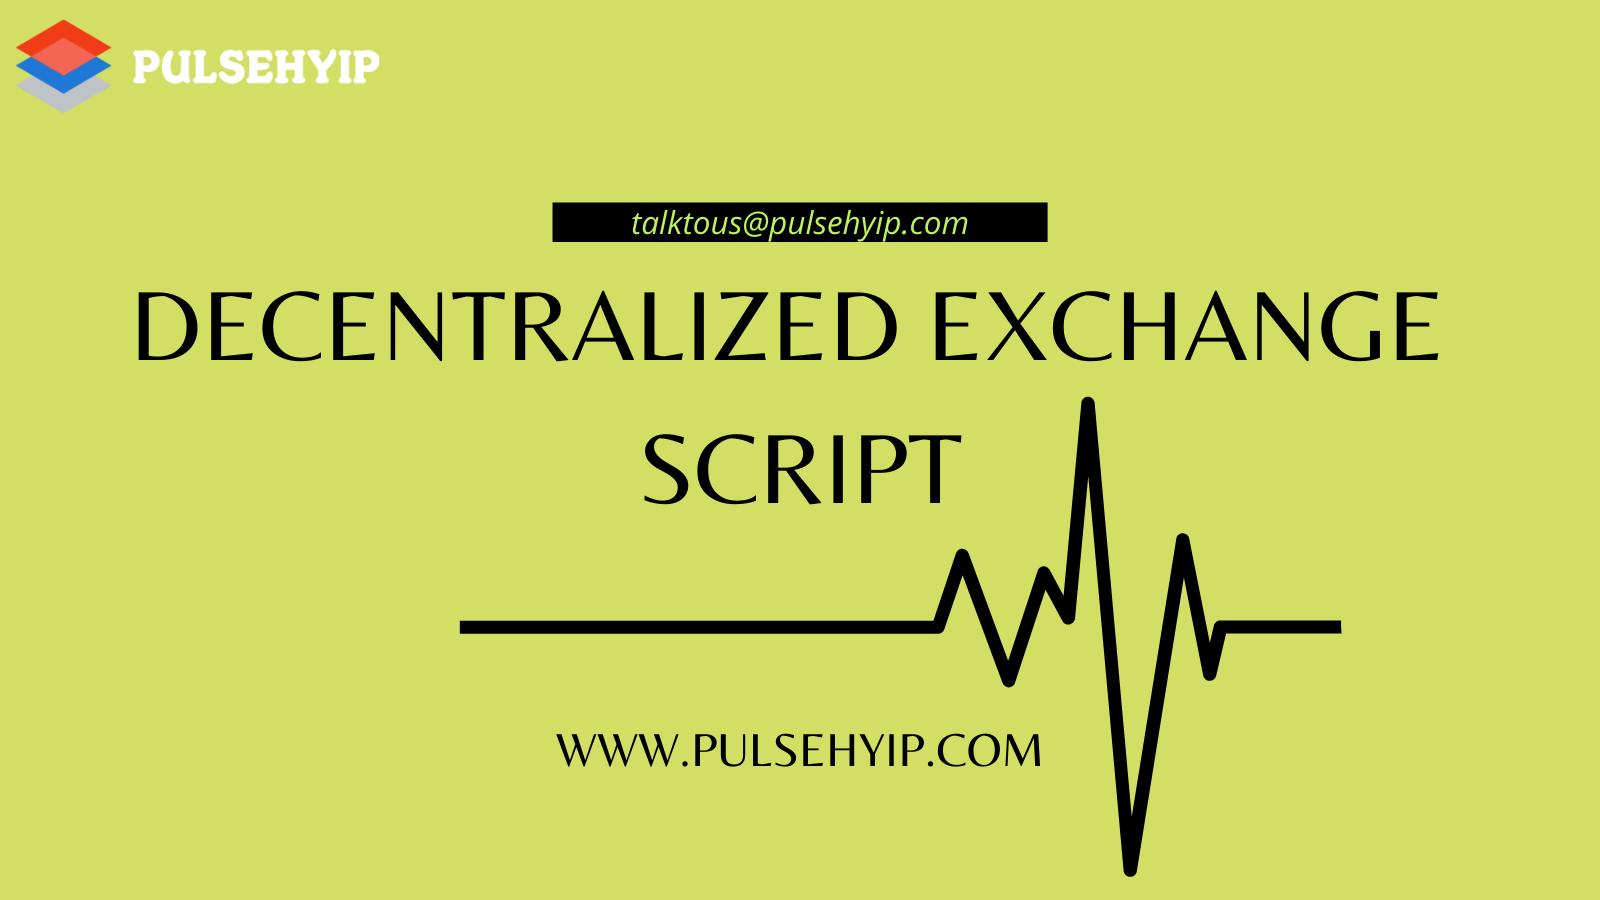 50374decentralized-exchange-script.png